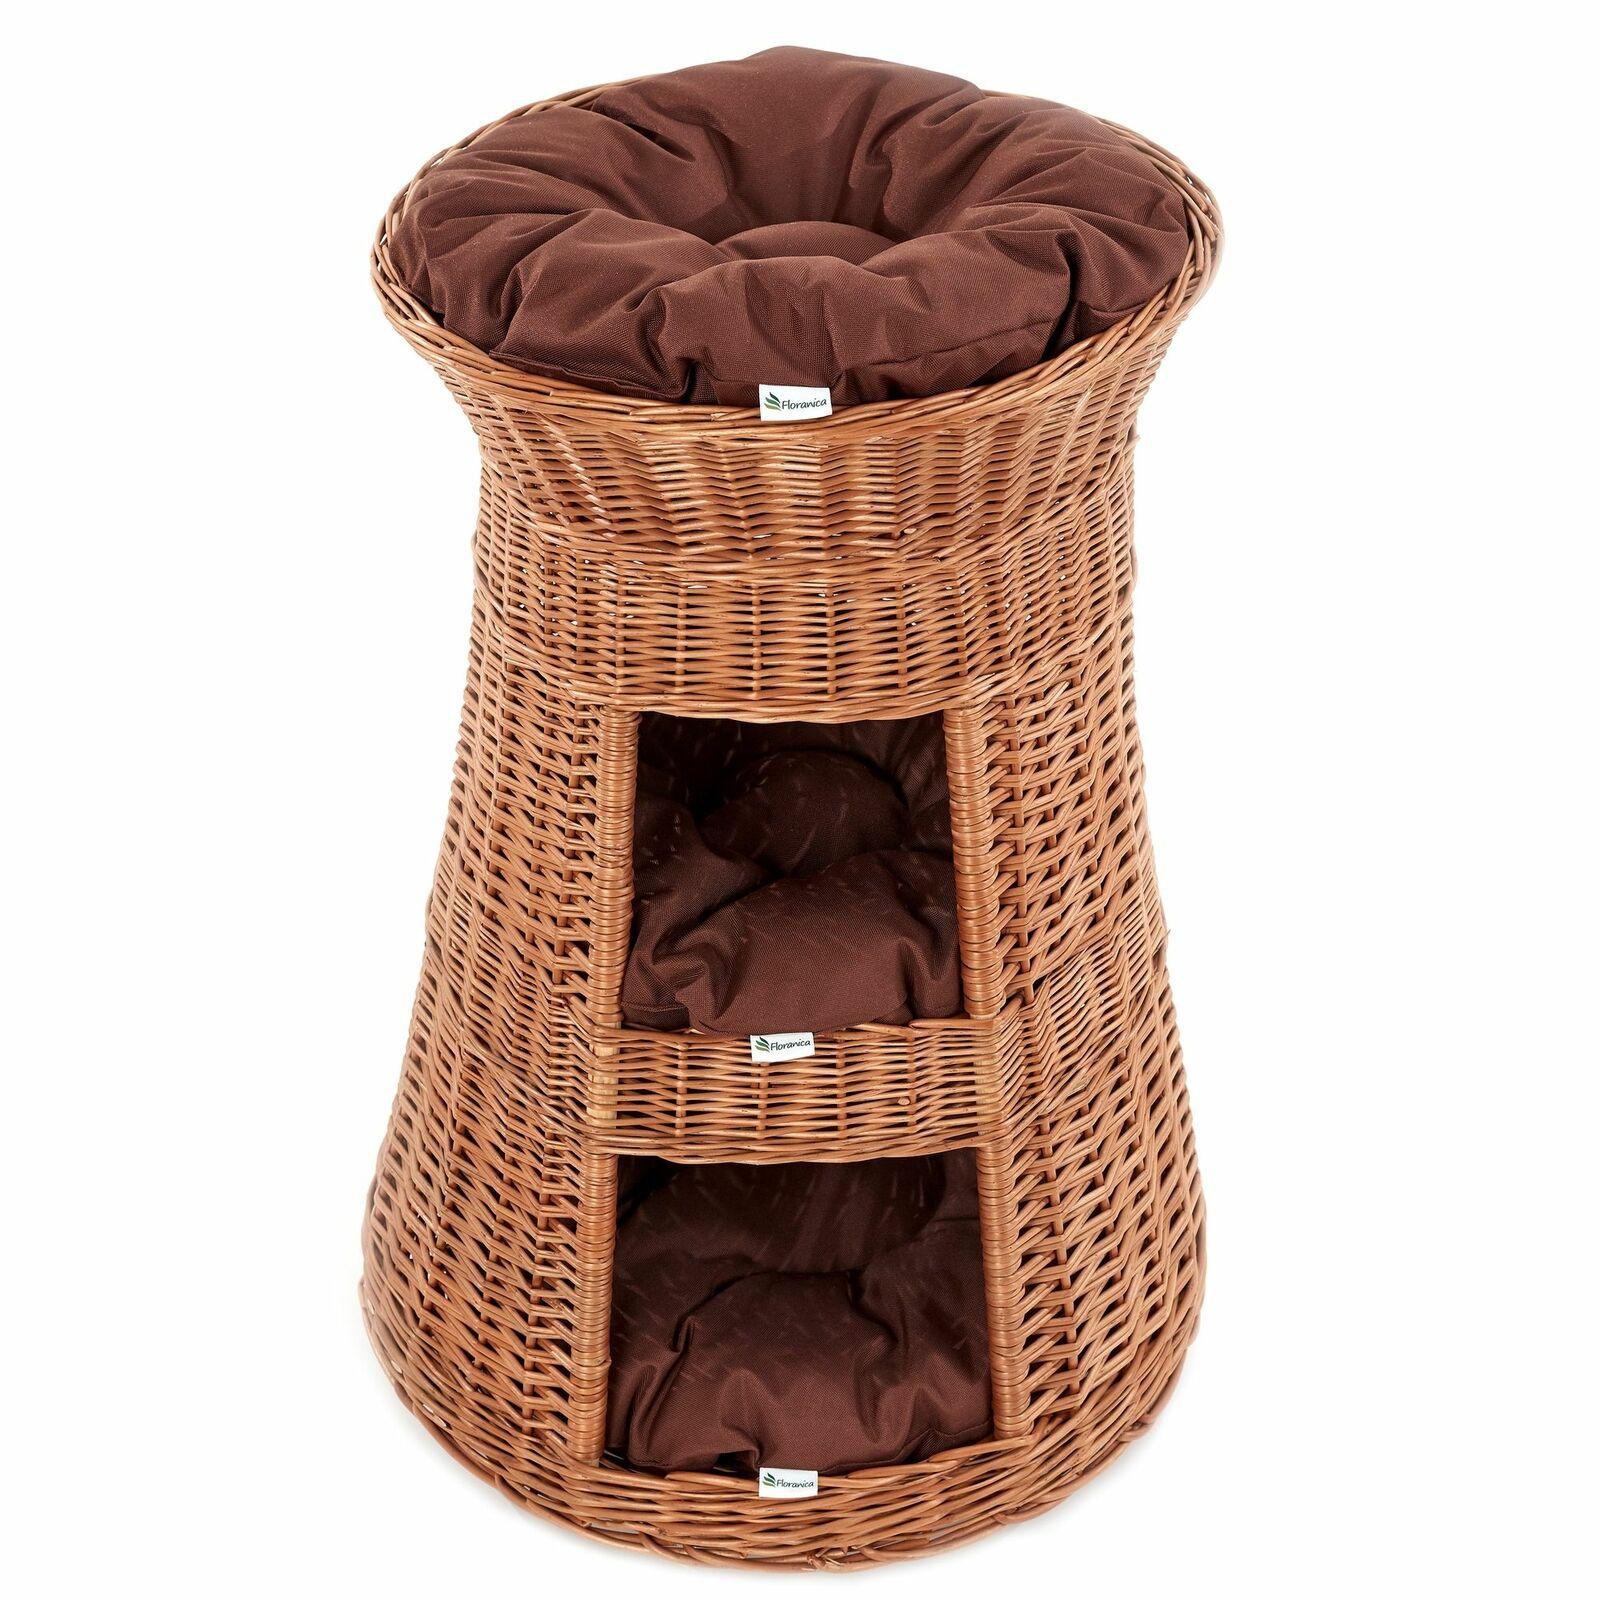 SUPERIOR tre livelli in vimini Cat Tower Letto Cesto House Organic Willow + CUSCINI